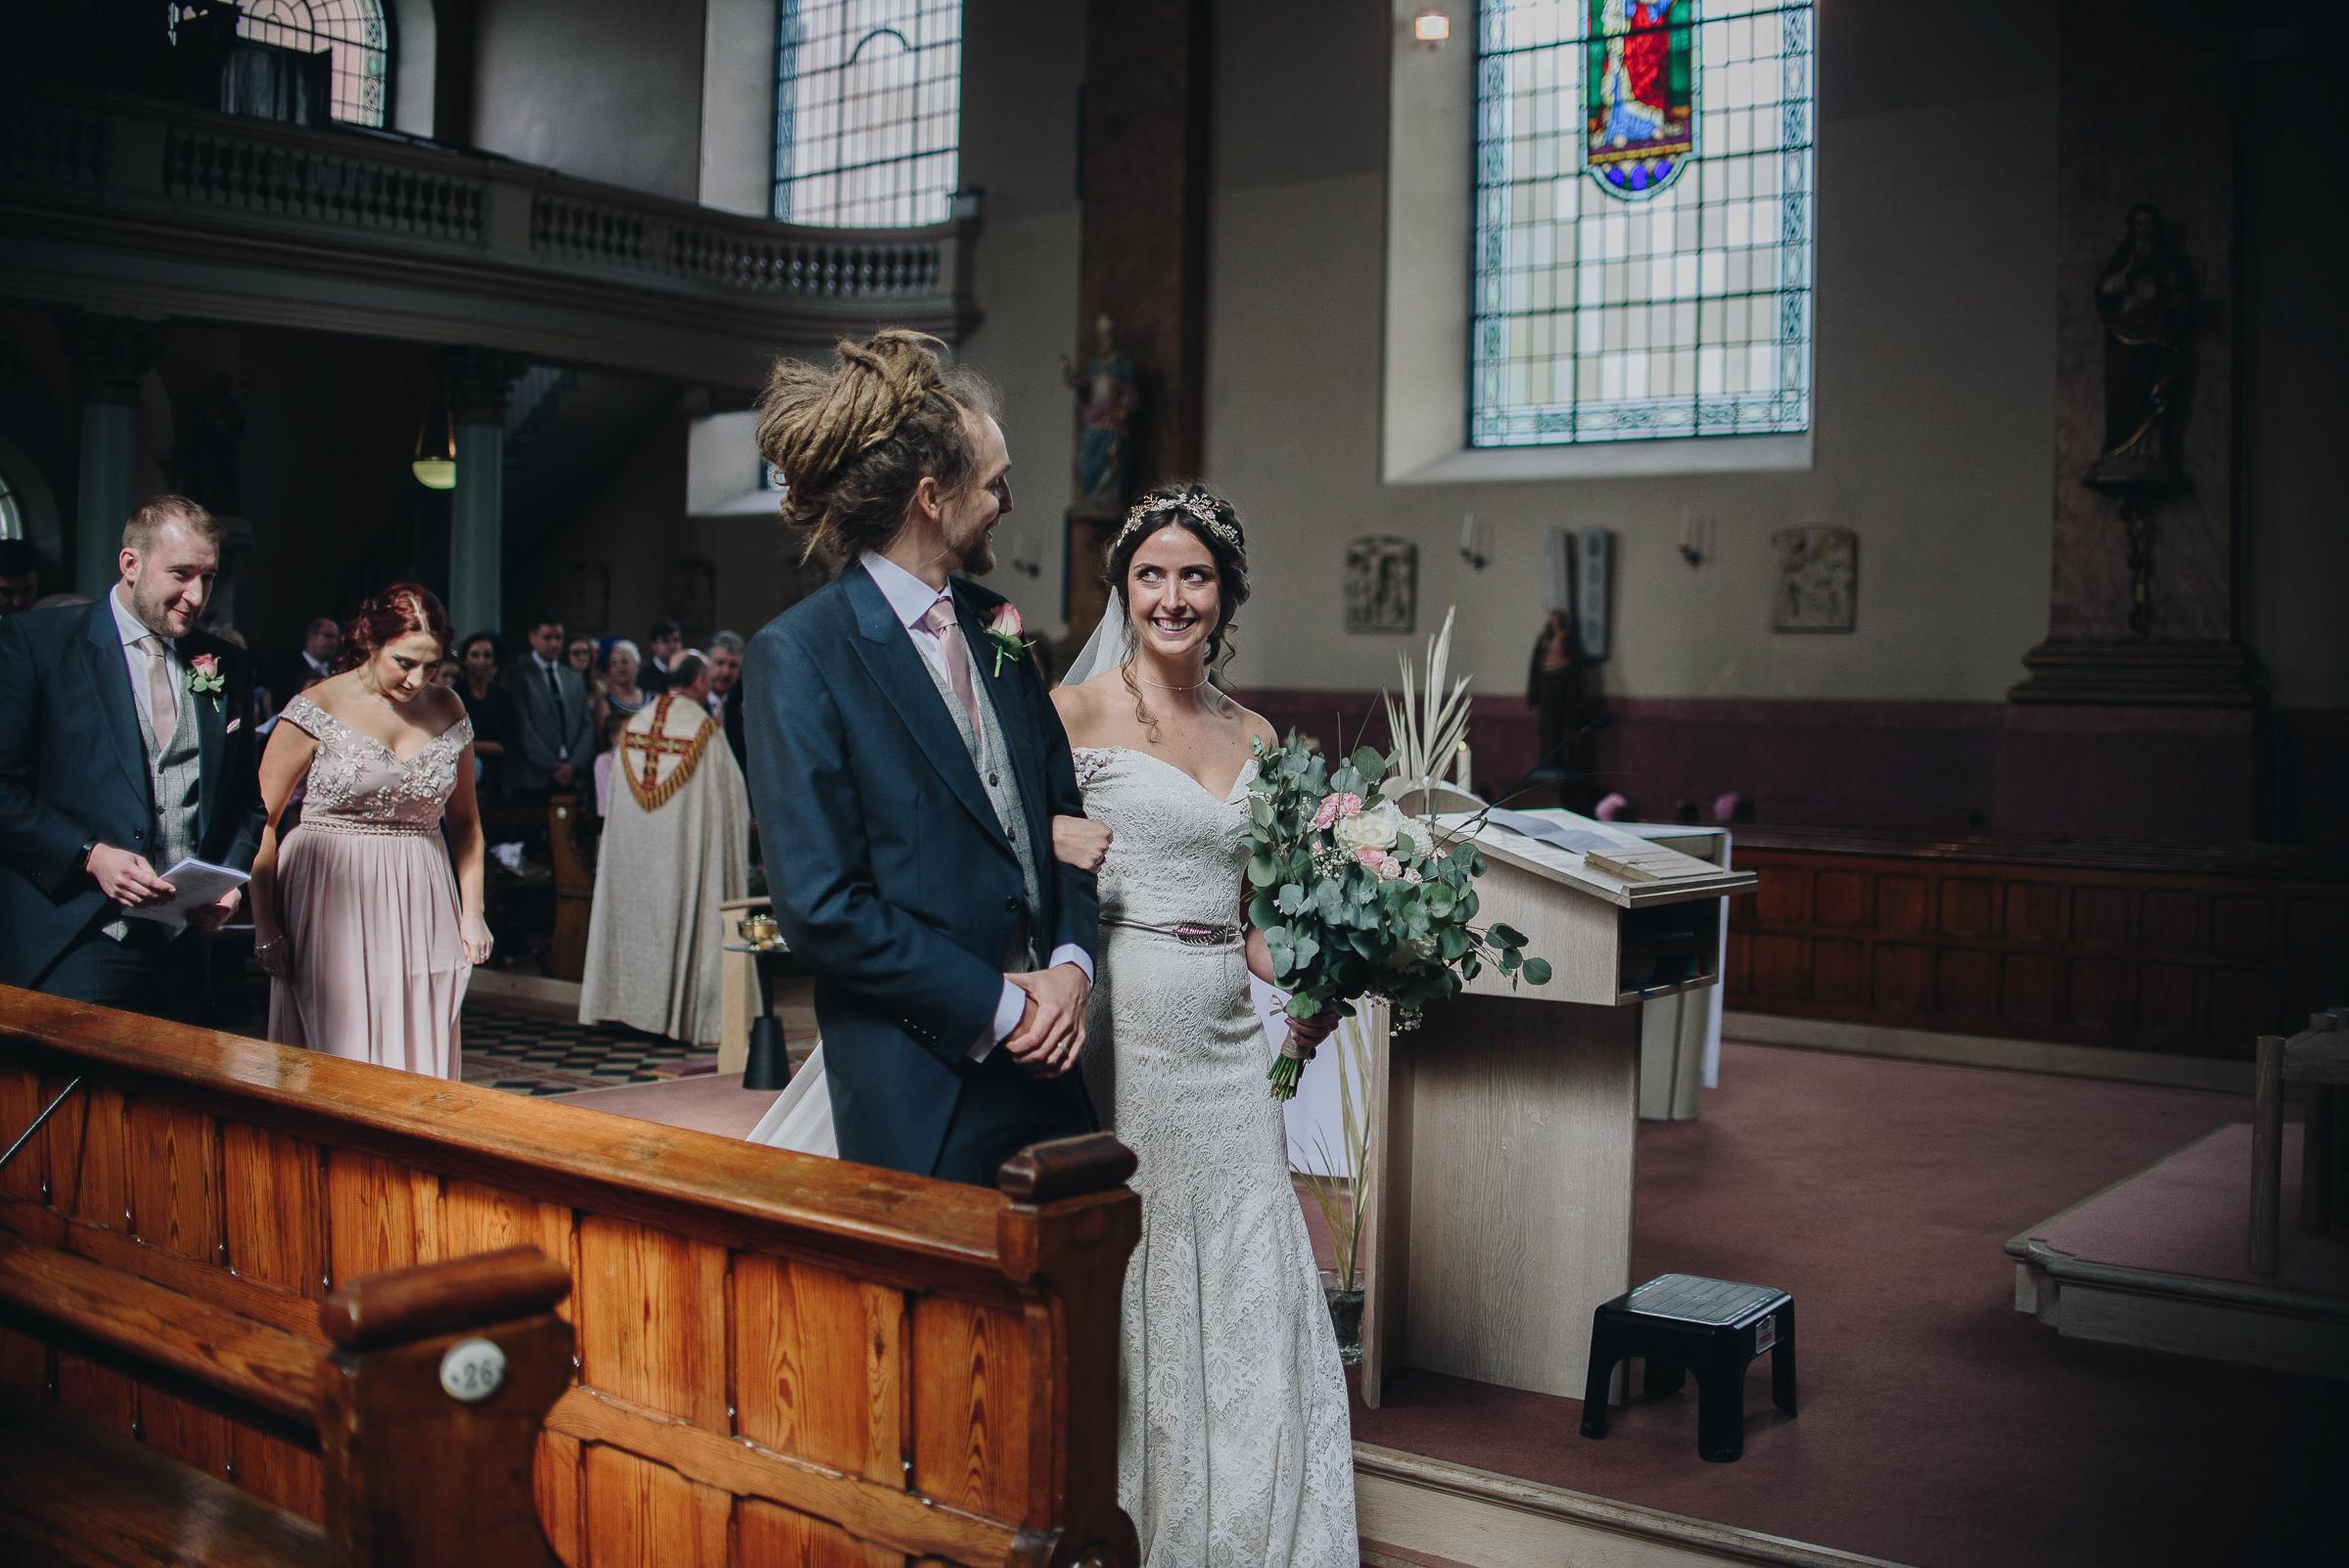 Rochdale-town-hall-vegan-harry-potter-wedding-photography-19.jpg